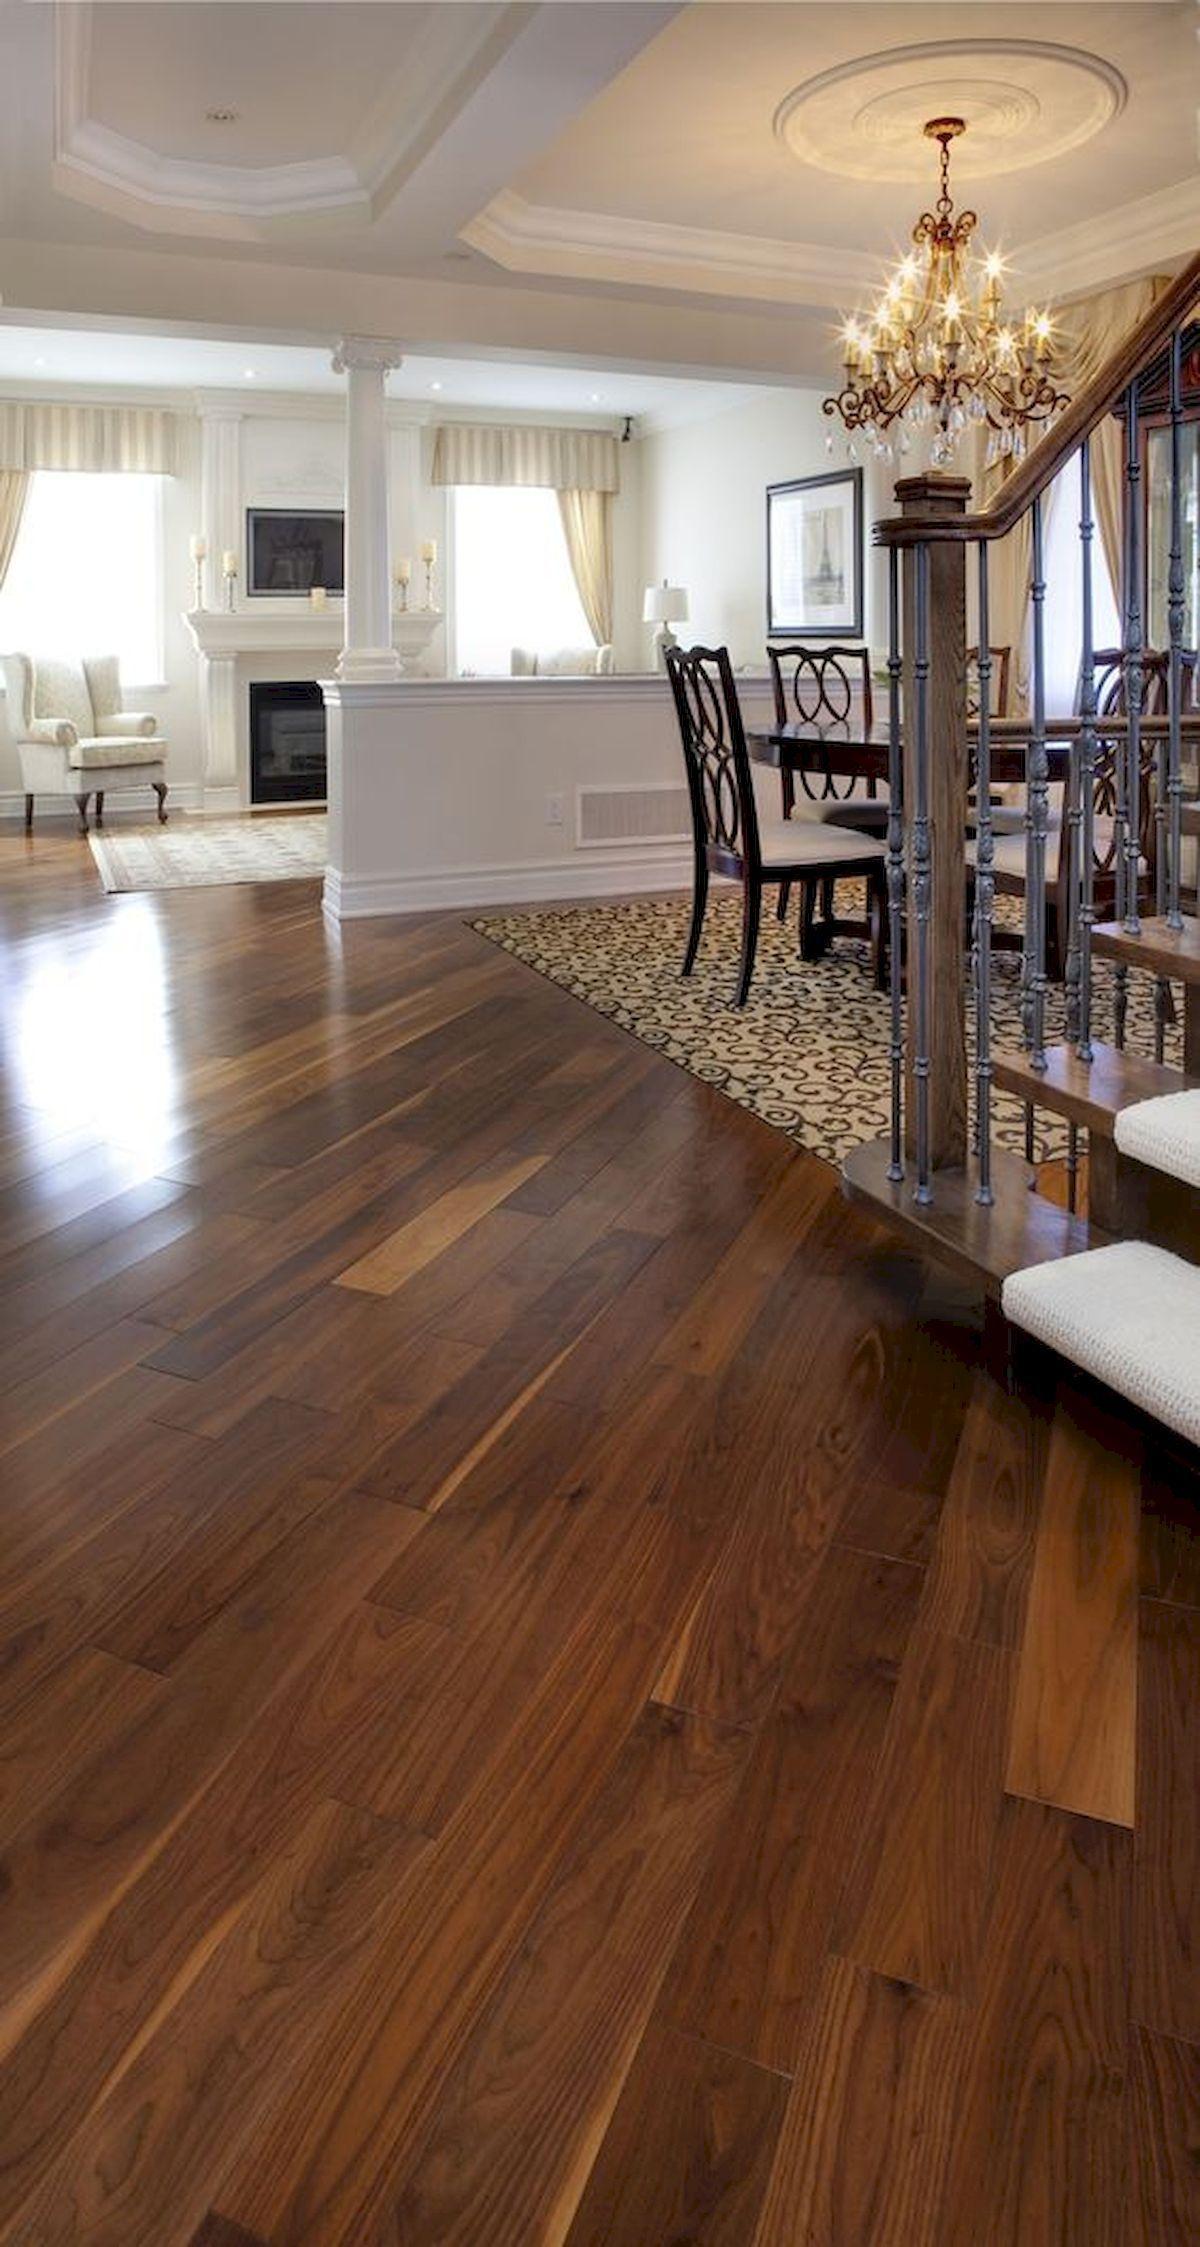 80 Gorgeous Hardwood Floor Ideas For Interior Home Wood Floor